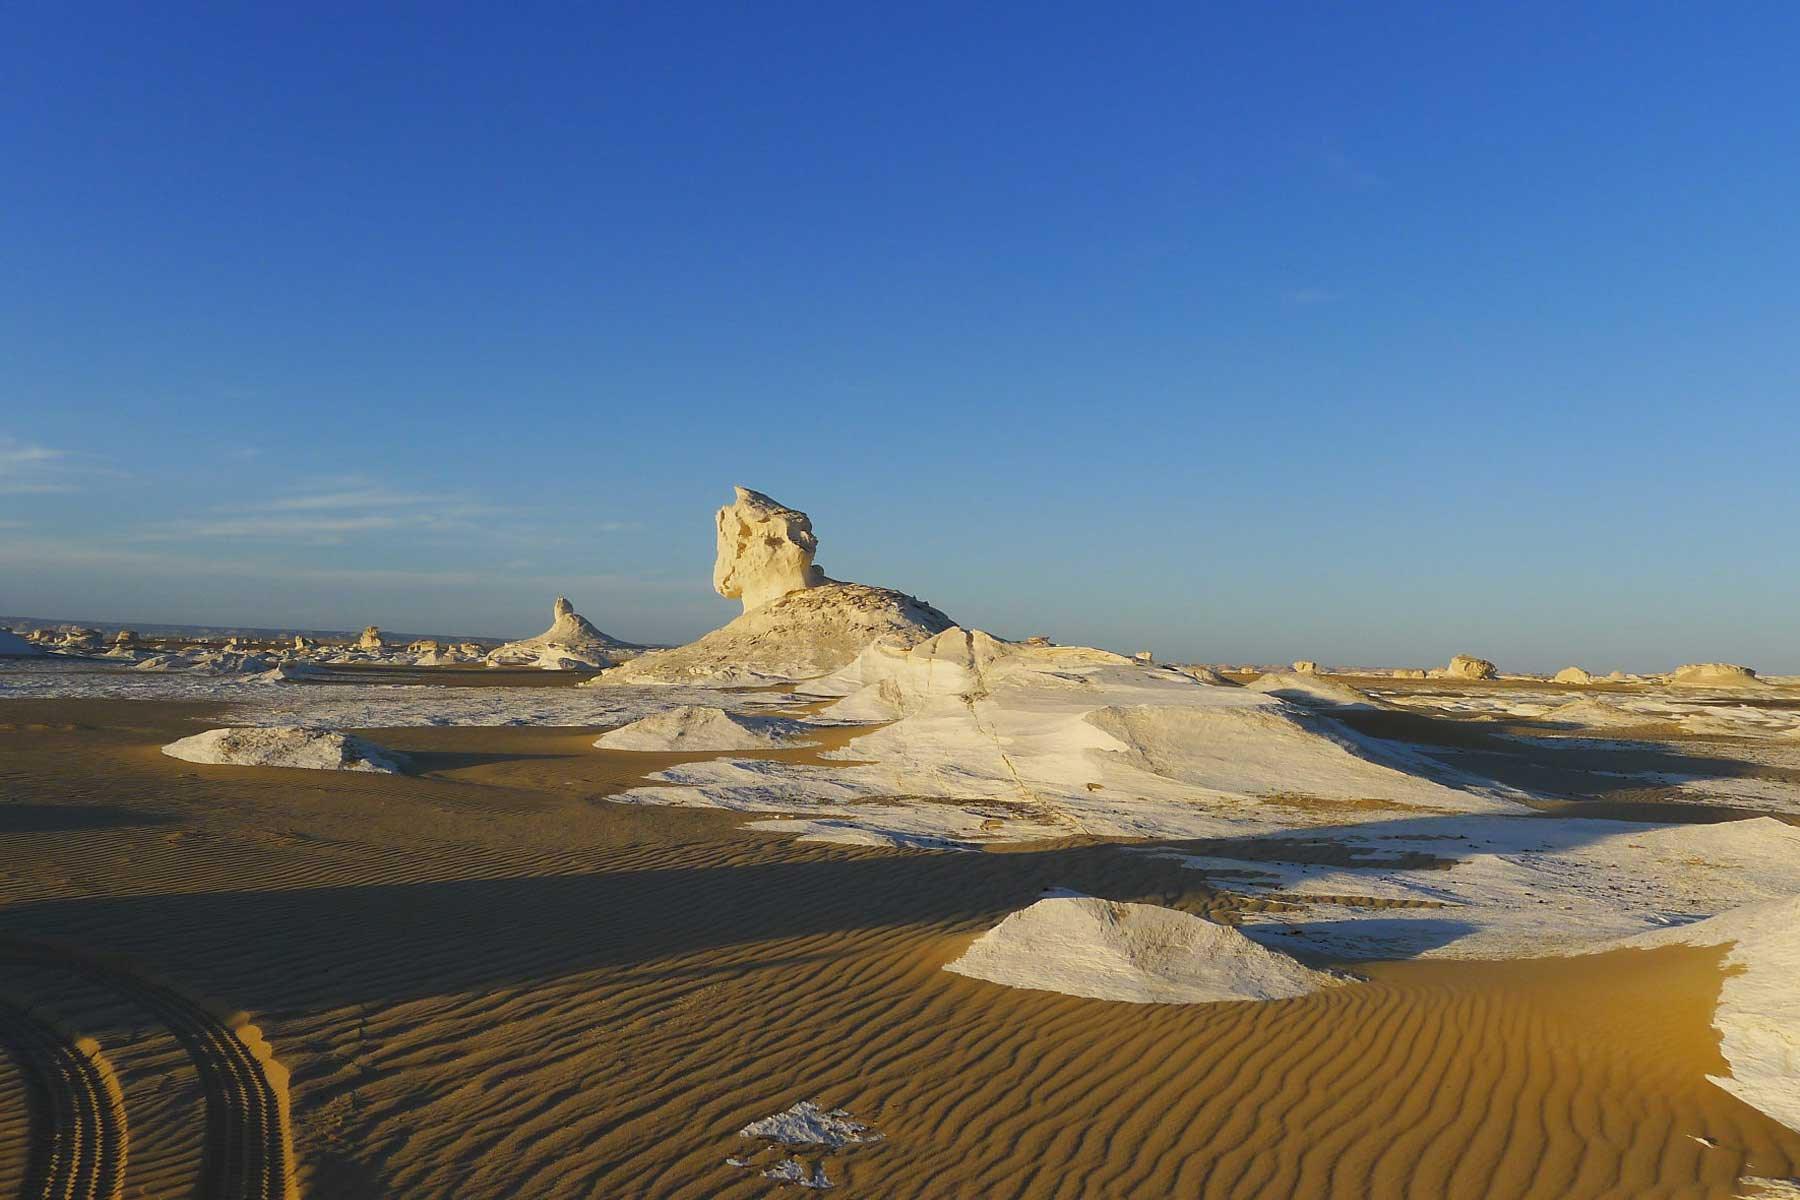 Bahariya oasis in Egypt